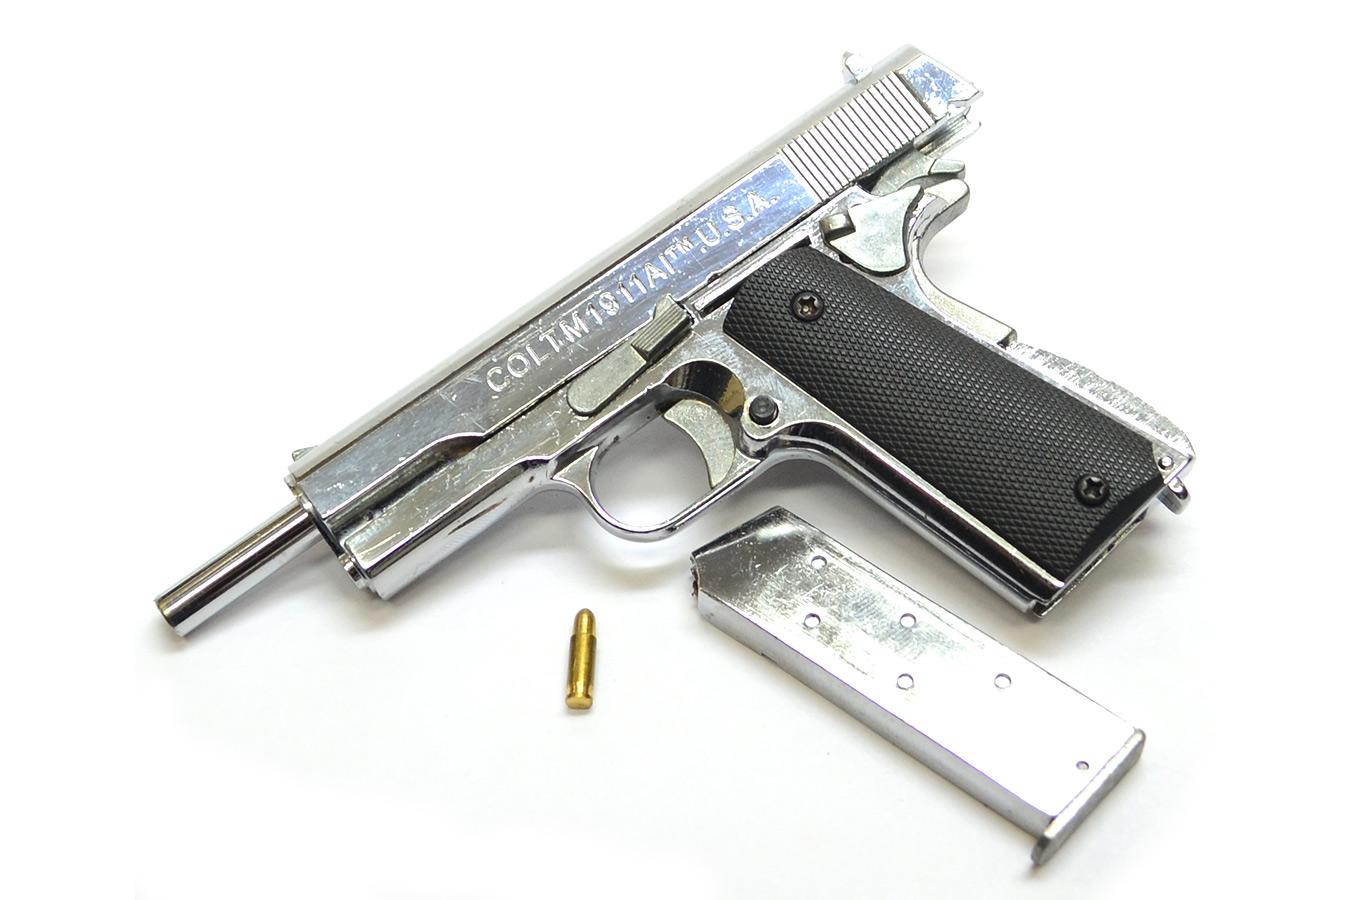 Макет пистолета Colt M1911 в масштабе 1:2